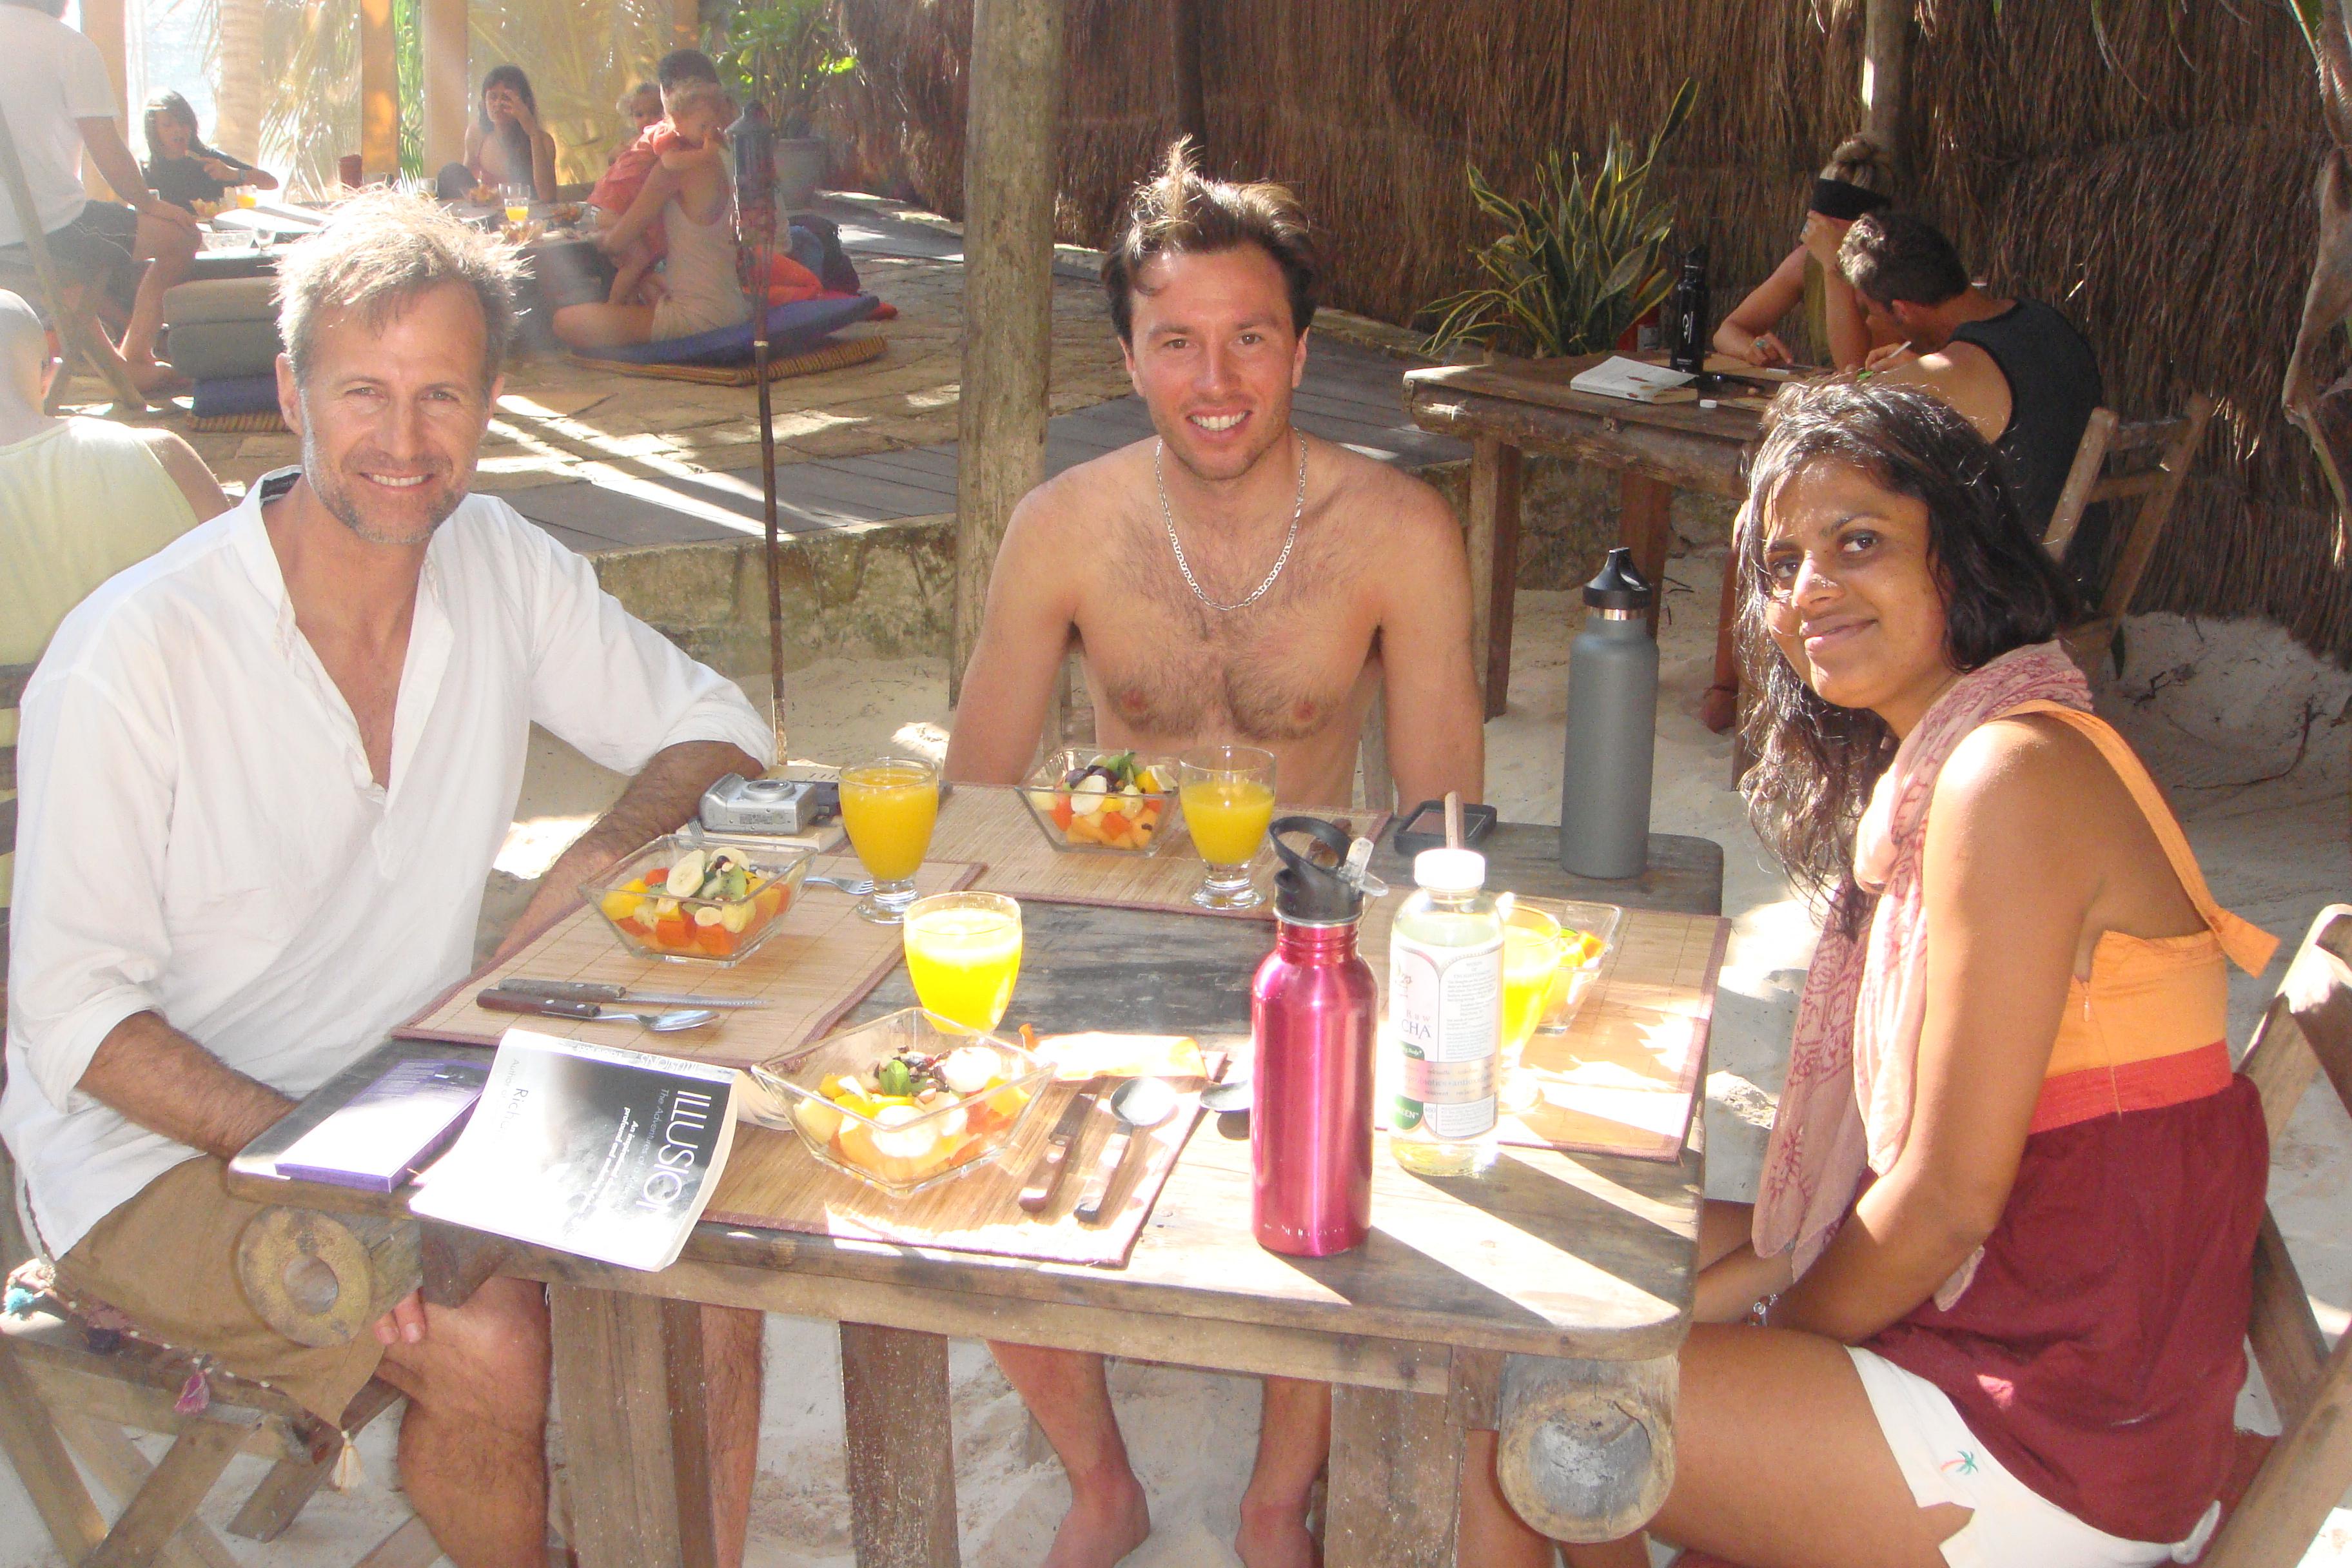 Enjoying breakfast together :)